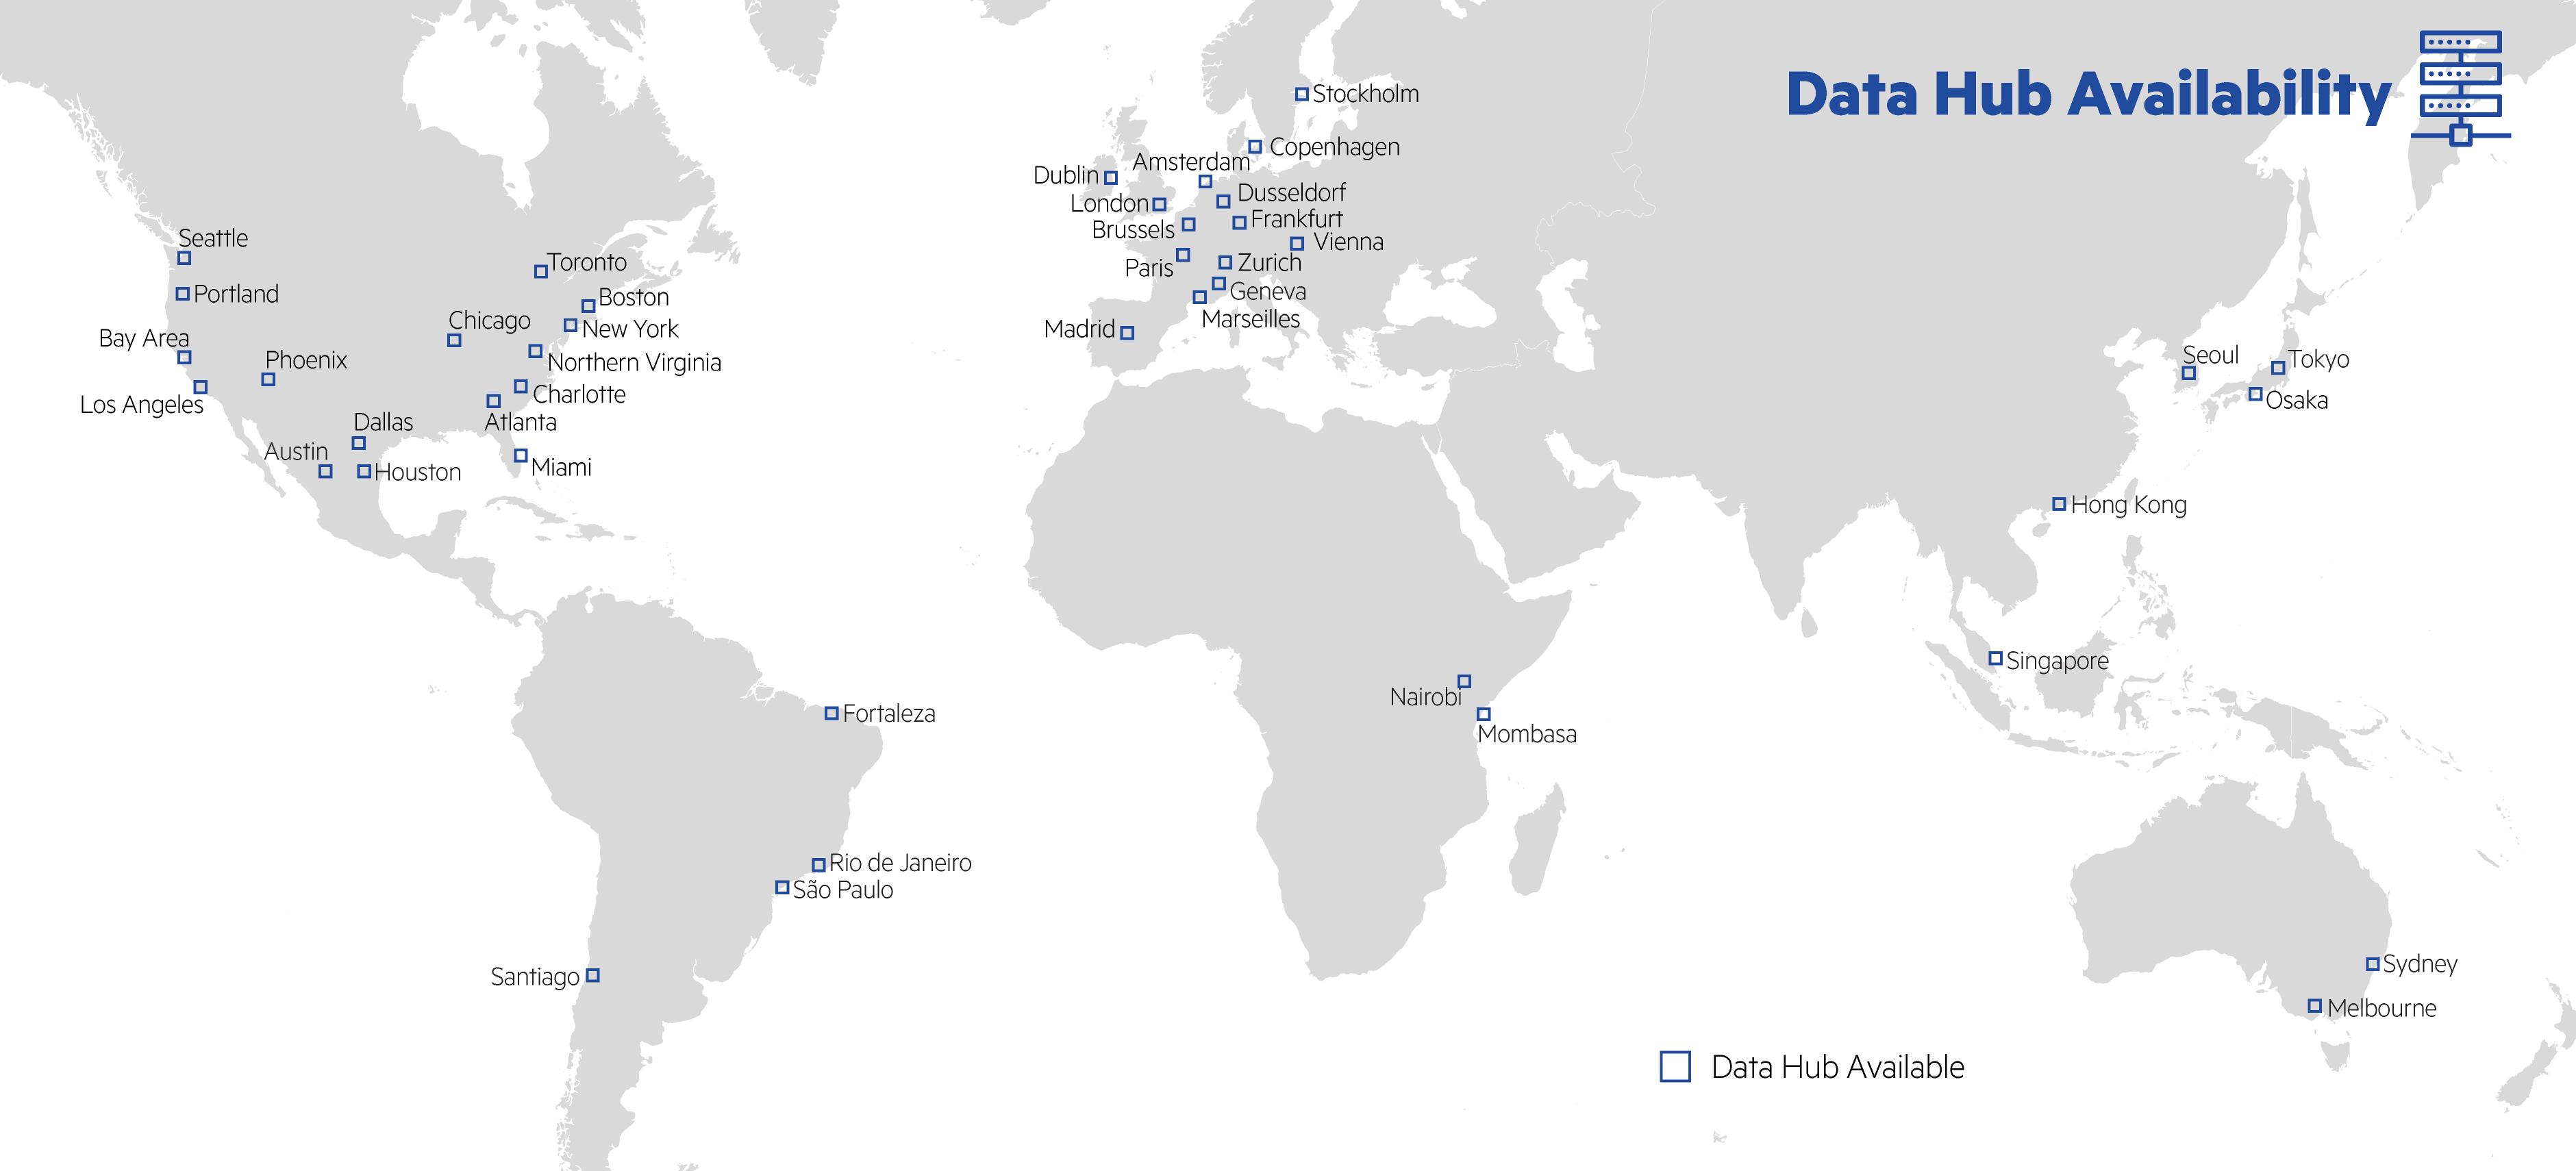 Data Hub Map